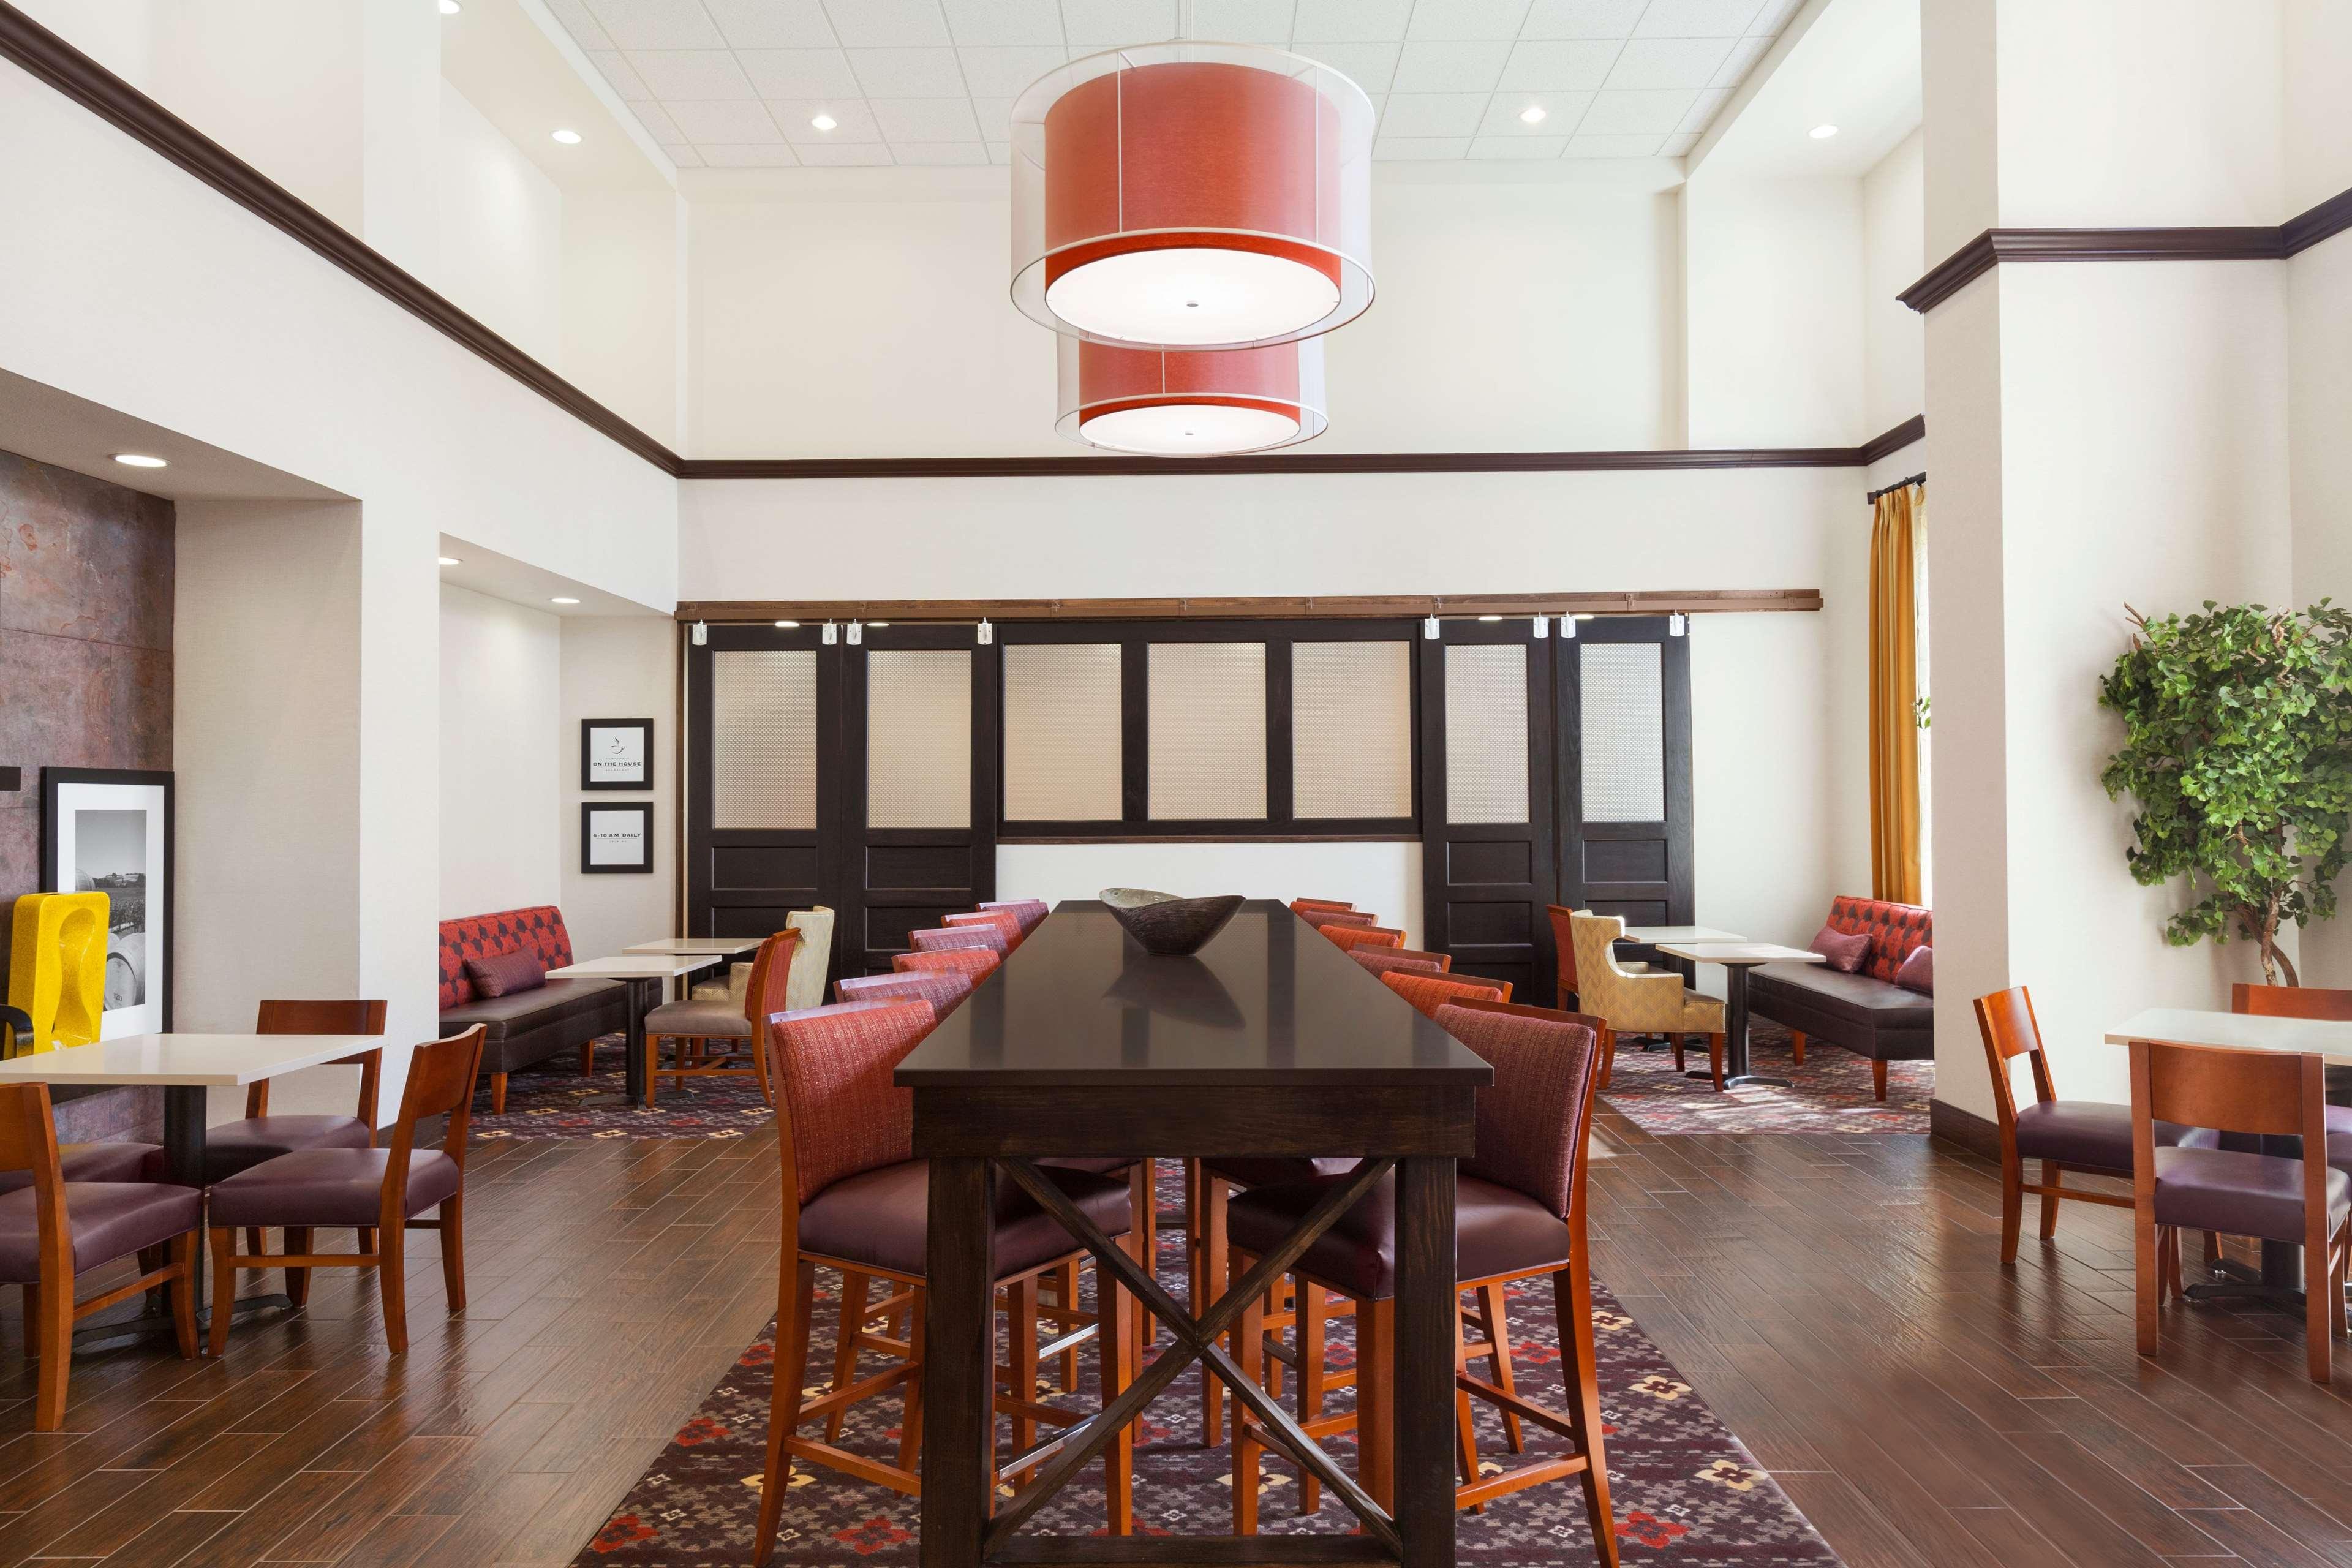 Hampton Inn & Suites Rohnert Park - Sonoma County image 7